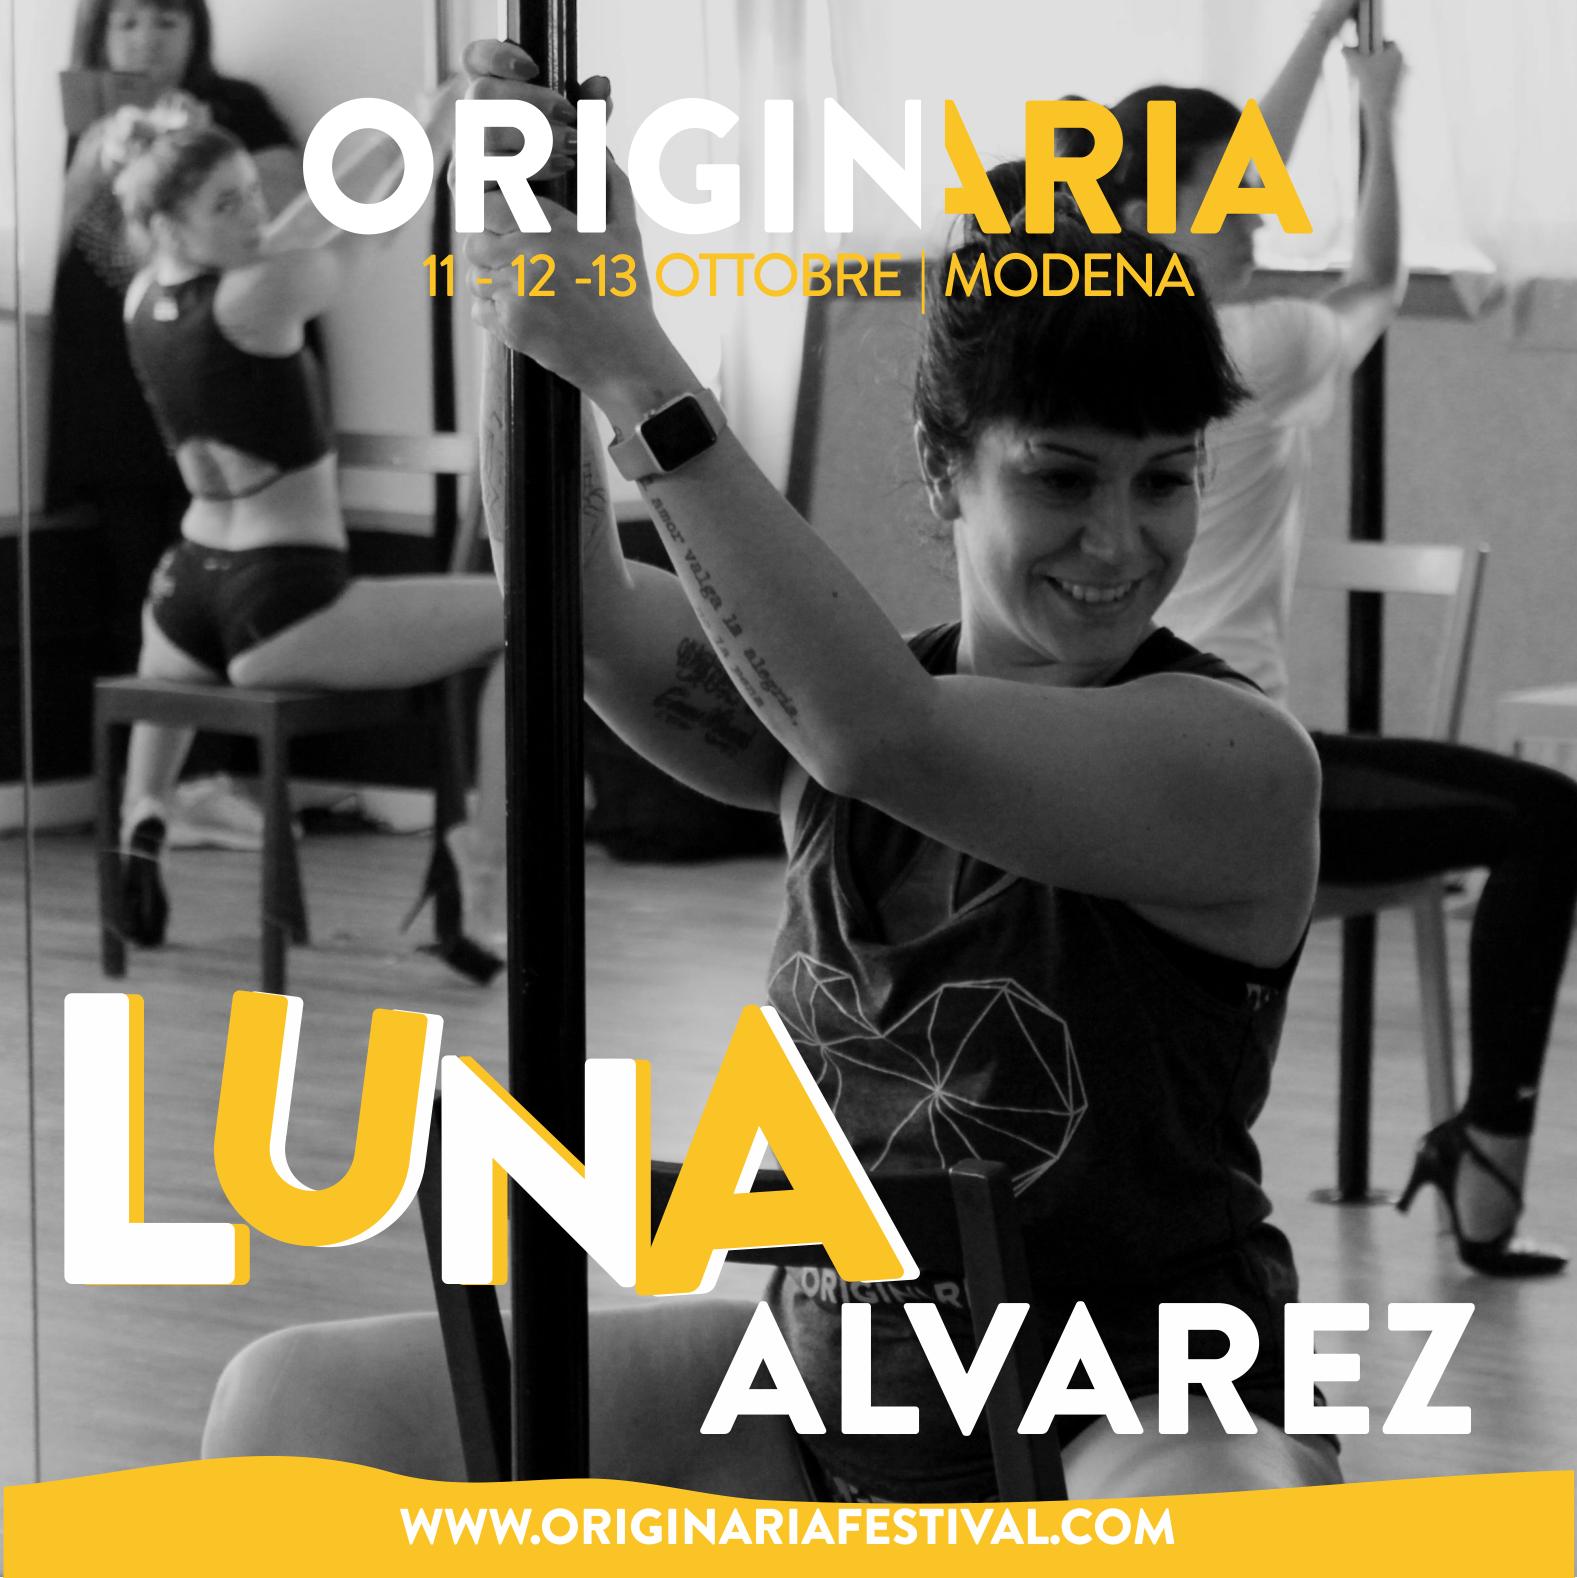 Luna Alvarez OriginAria Festival